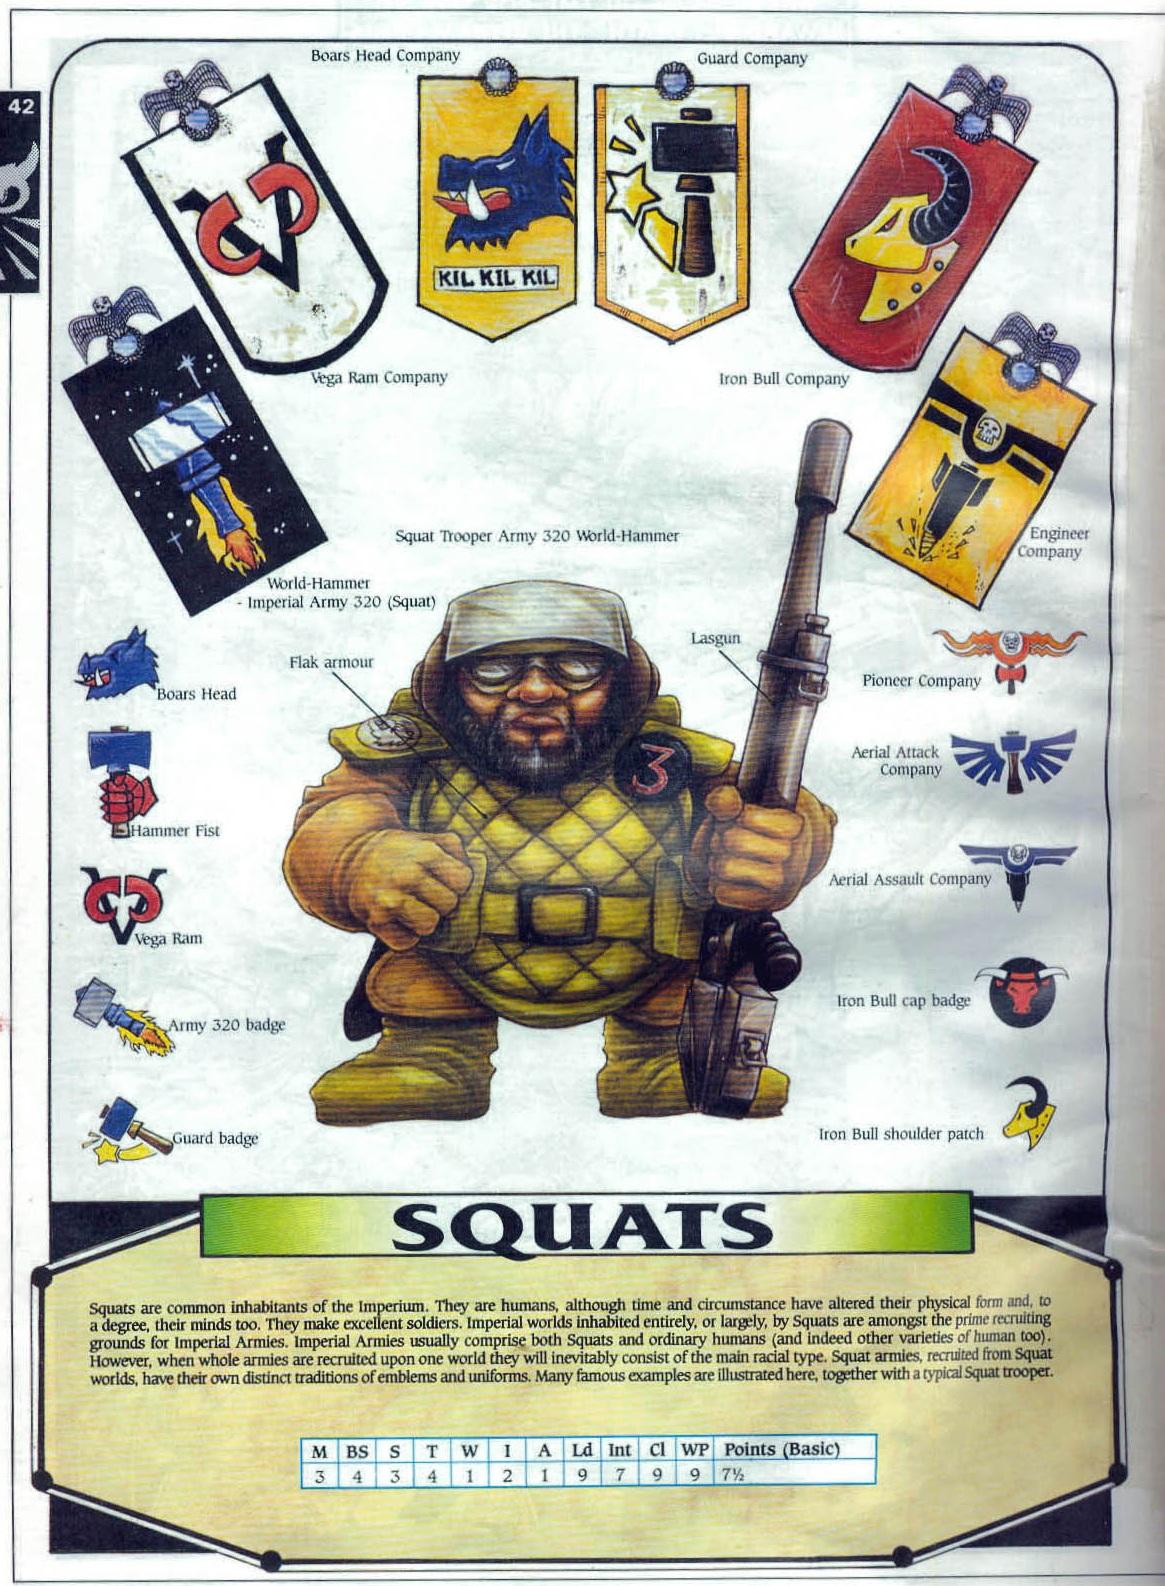 Squats_are_common.jpg